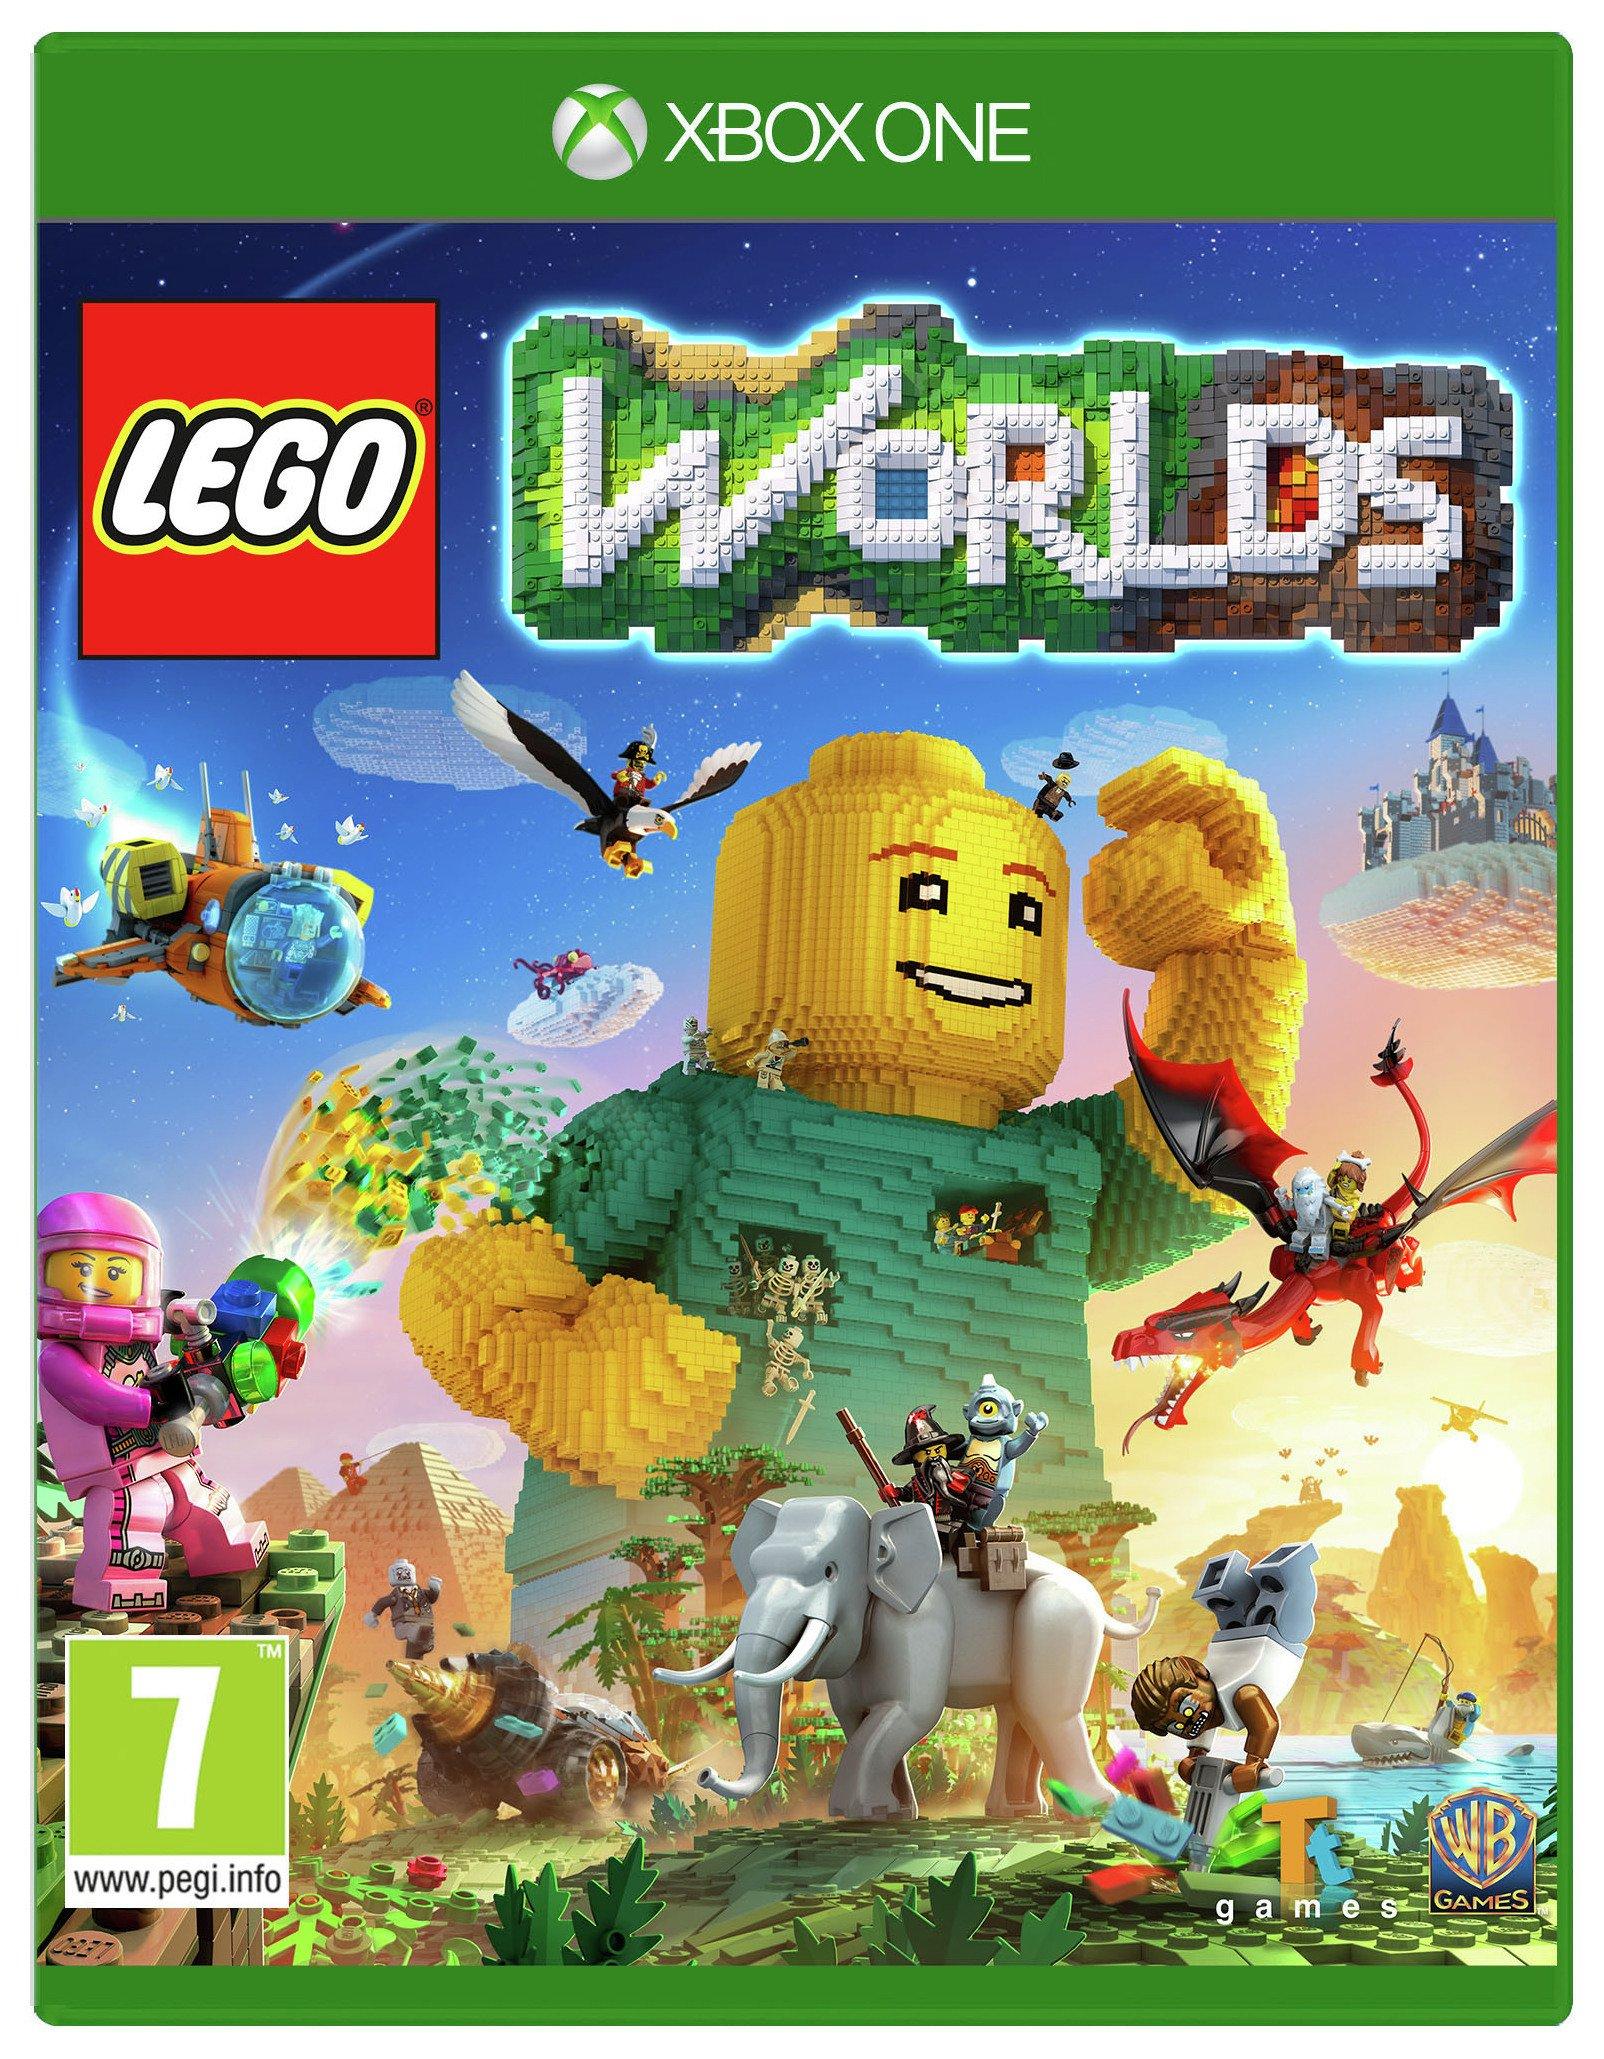 Lego Worlds Xbox One Game.